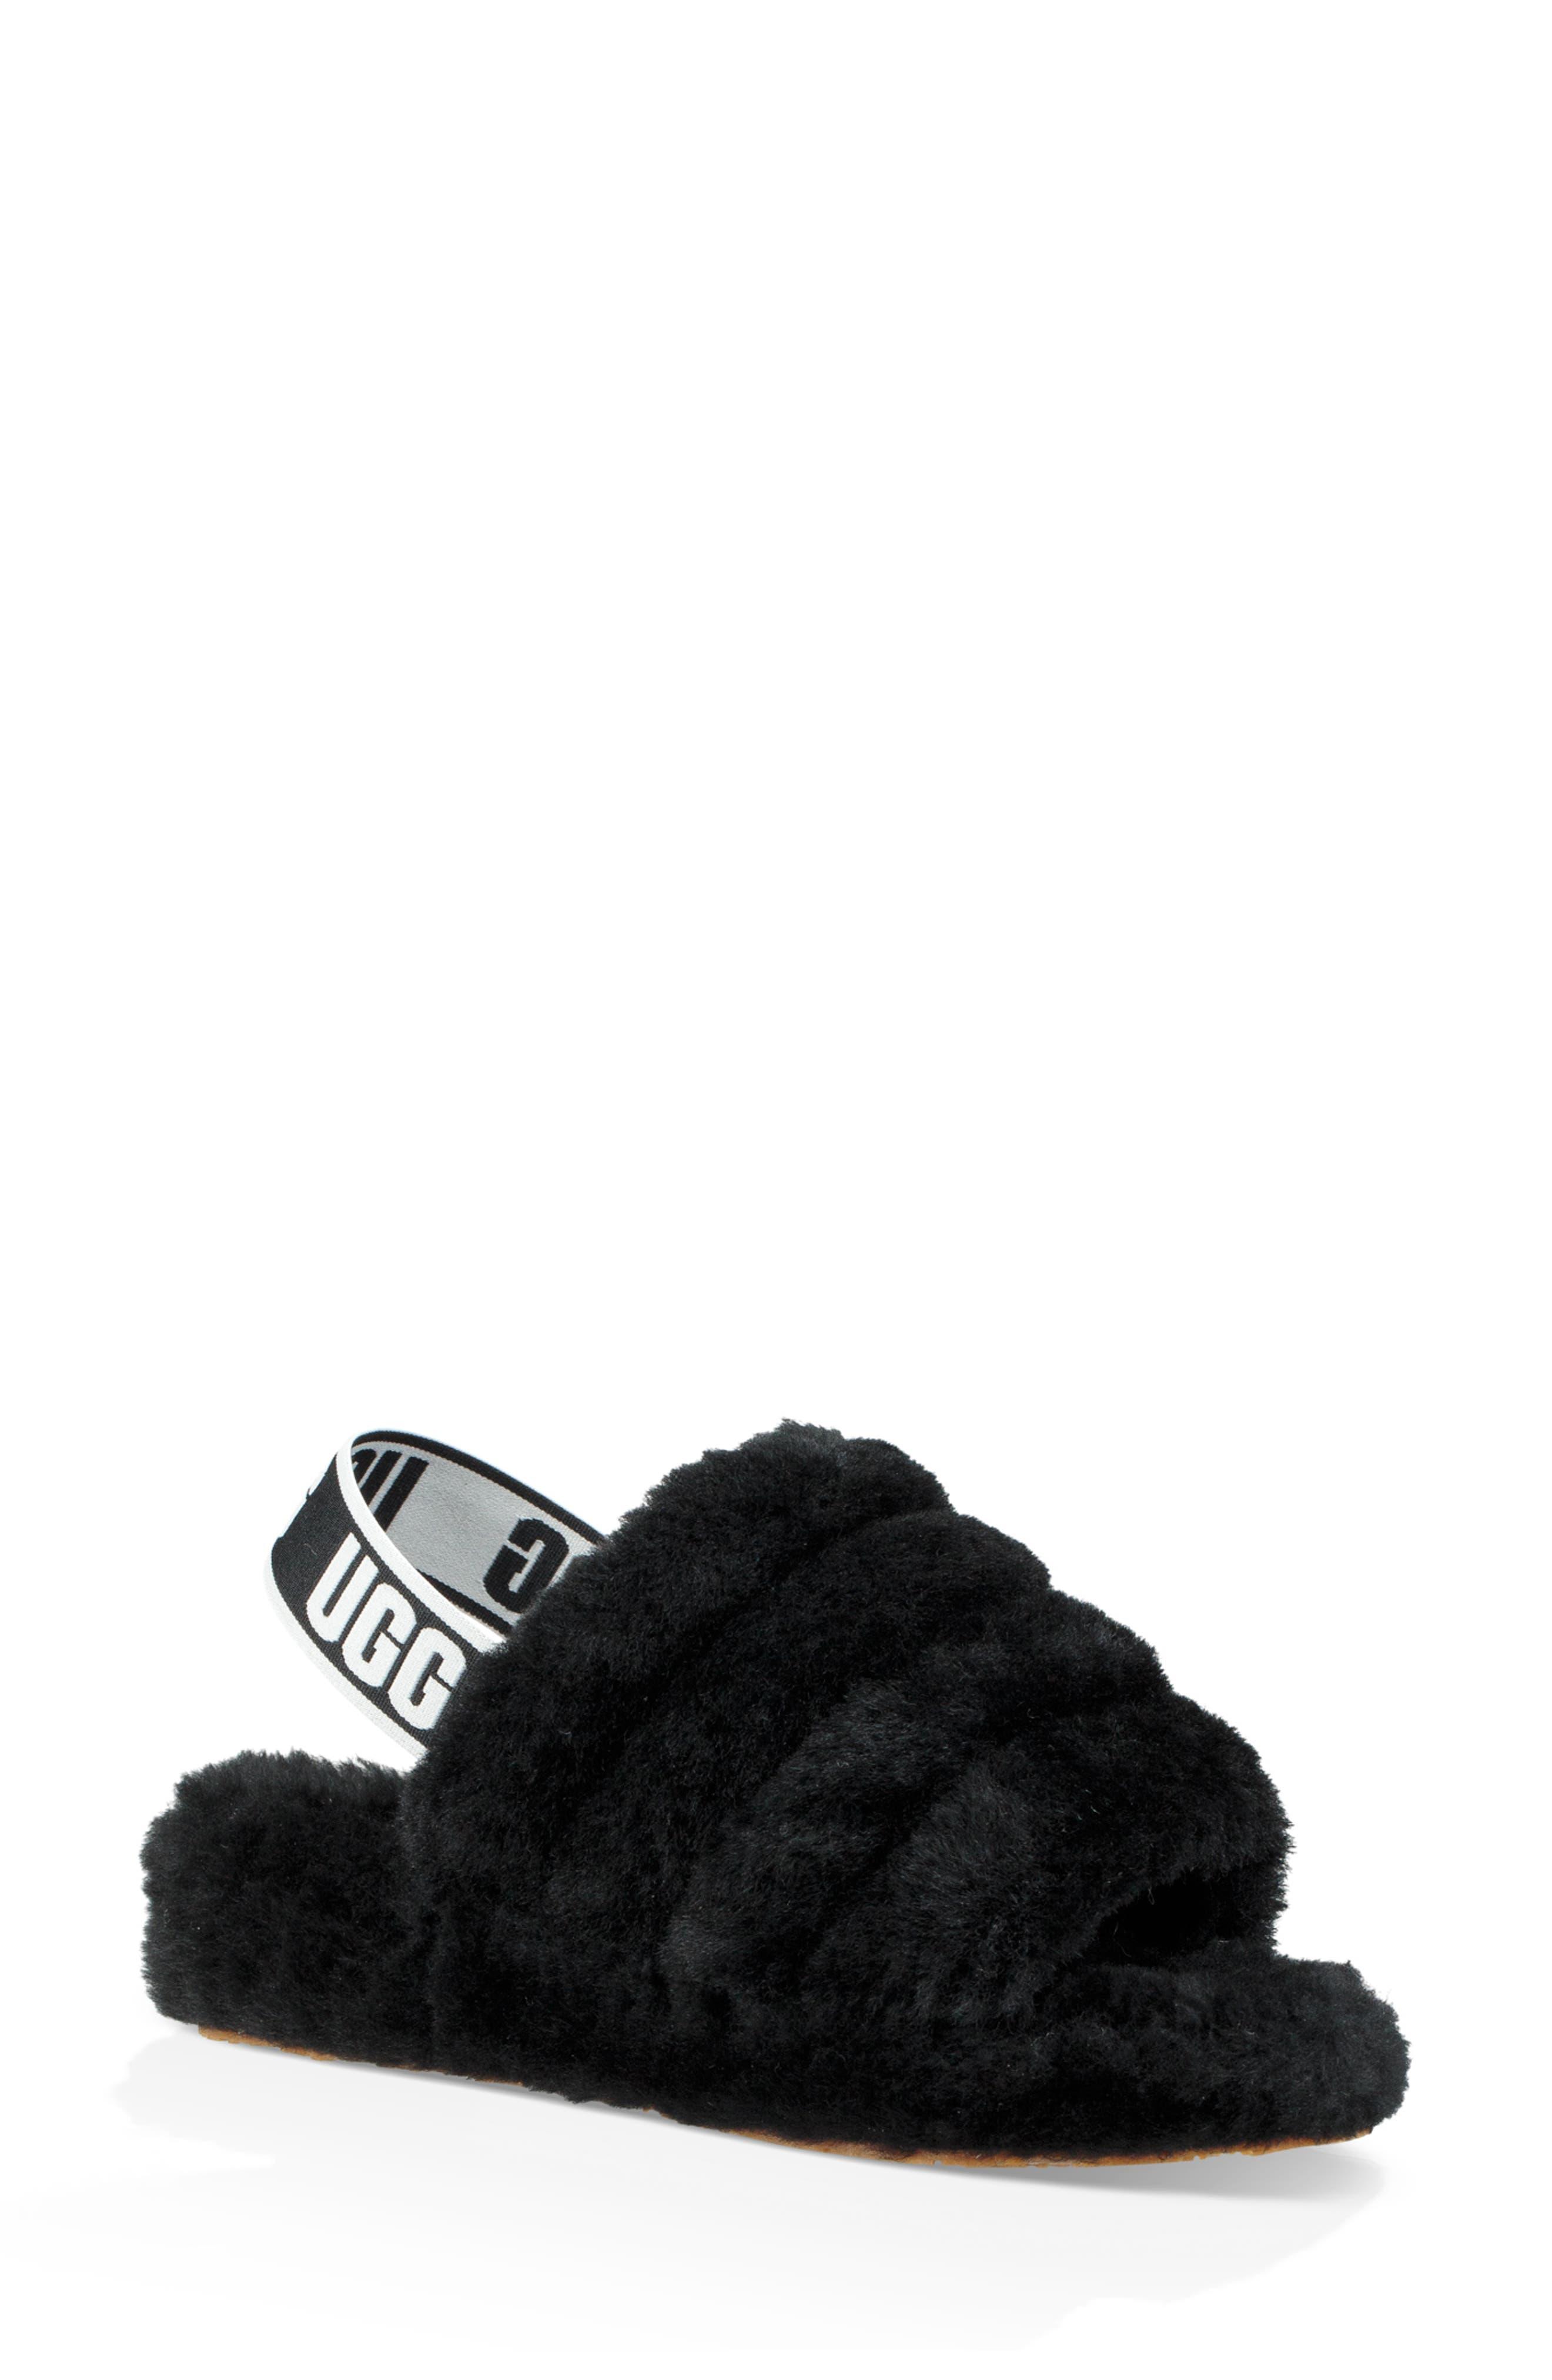 fb6bc9f6a Ugg Slippers - Women's - Shearling / Sheepskin Slippers